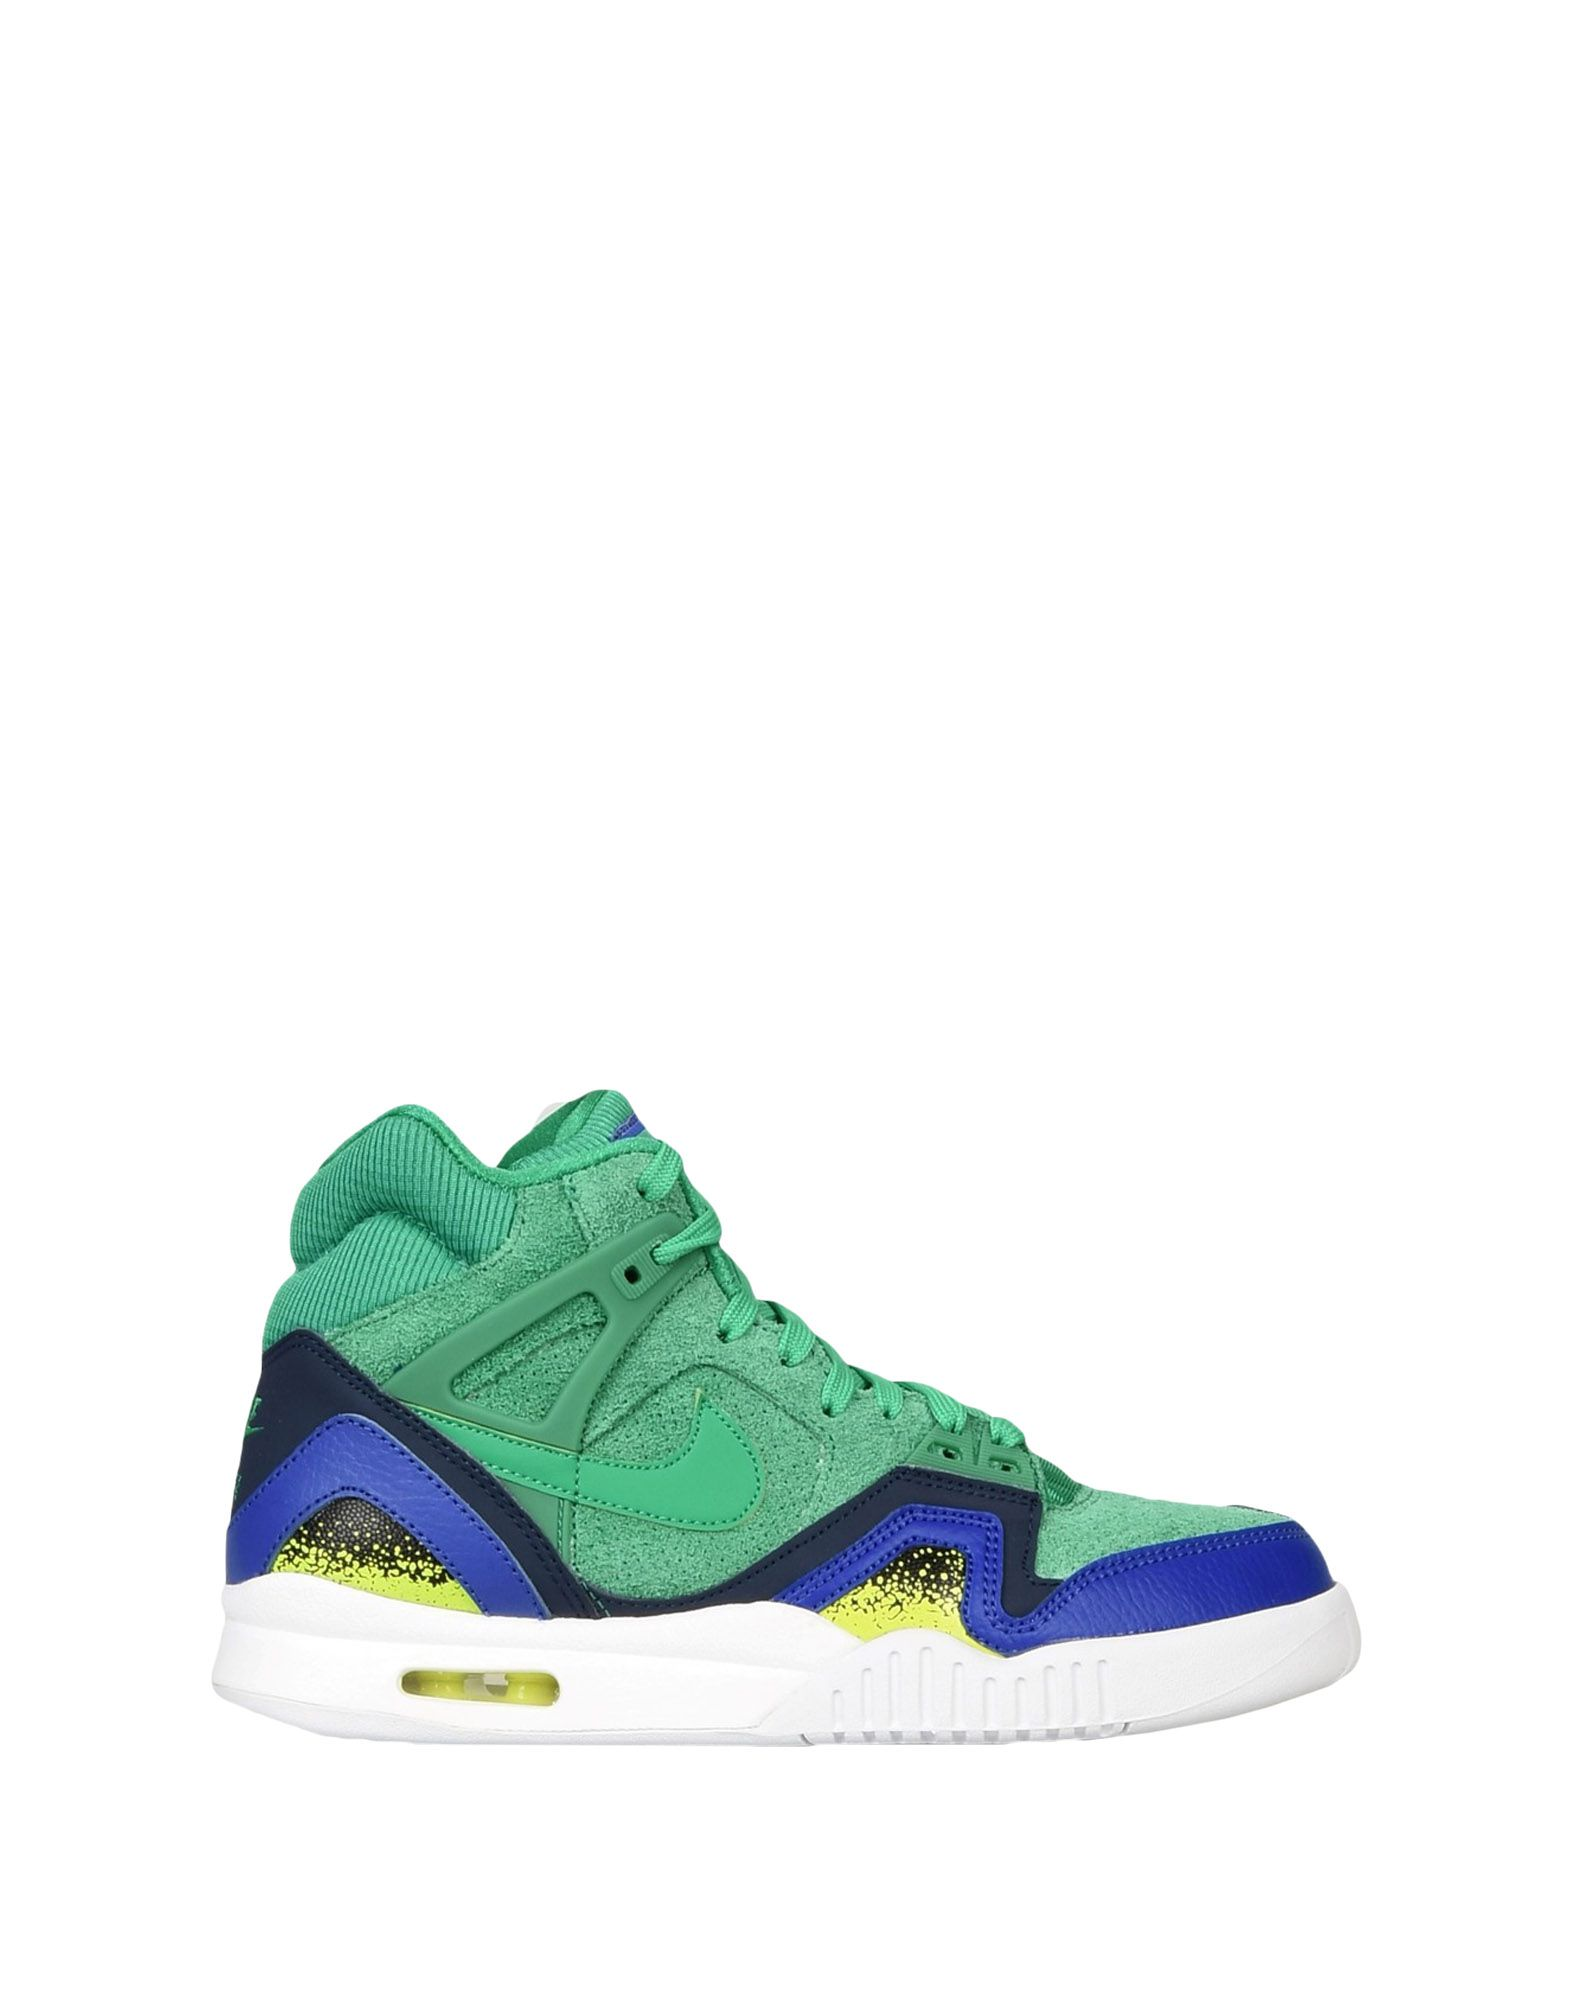 Nike  Air Air Air Tech Challenge Ii Se - Sneakers - Women Nike Sneakers online on  United Kingdom - 11215982TF afc506